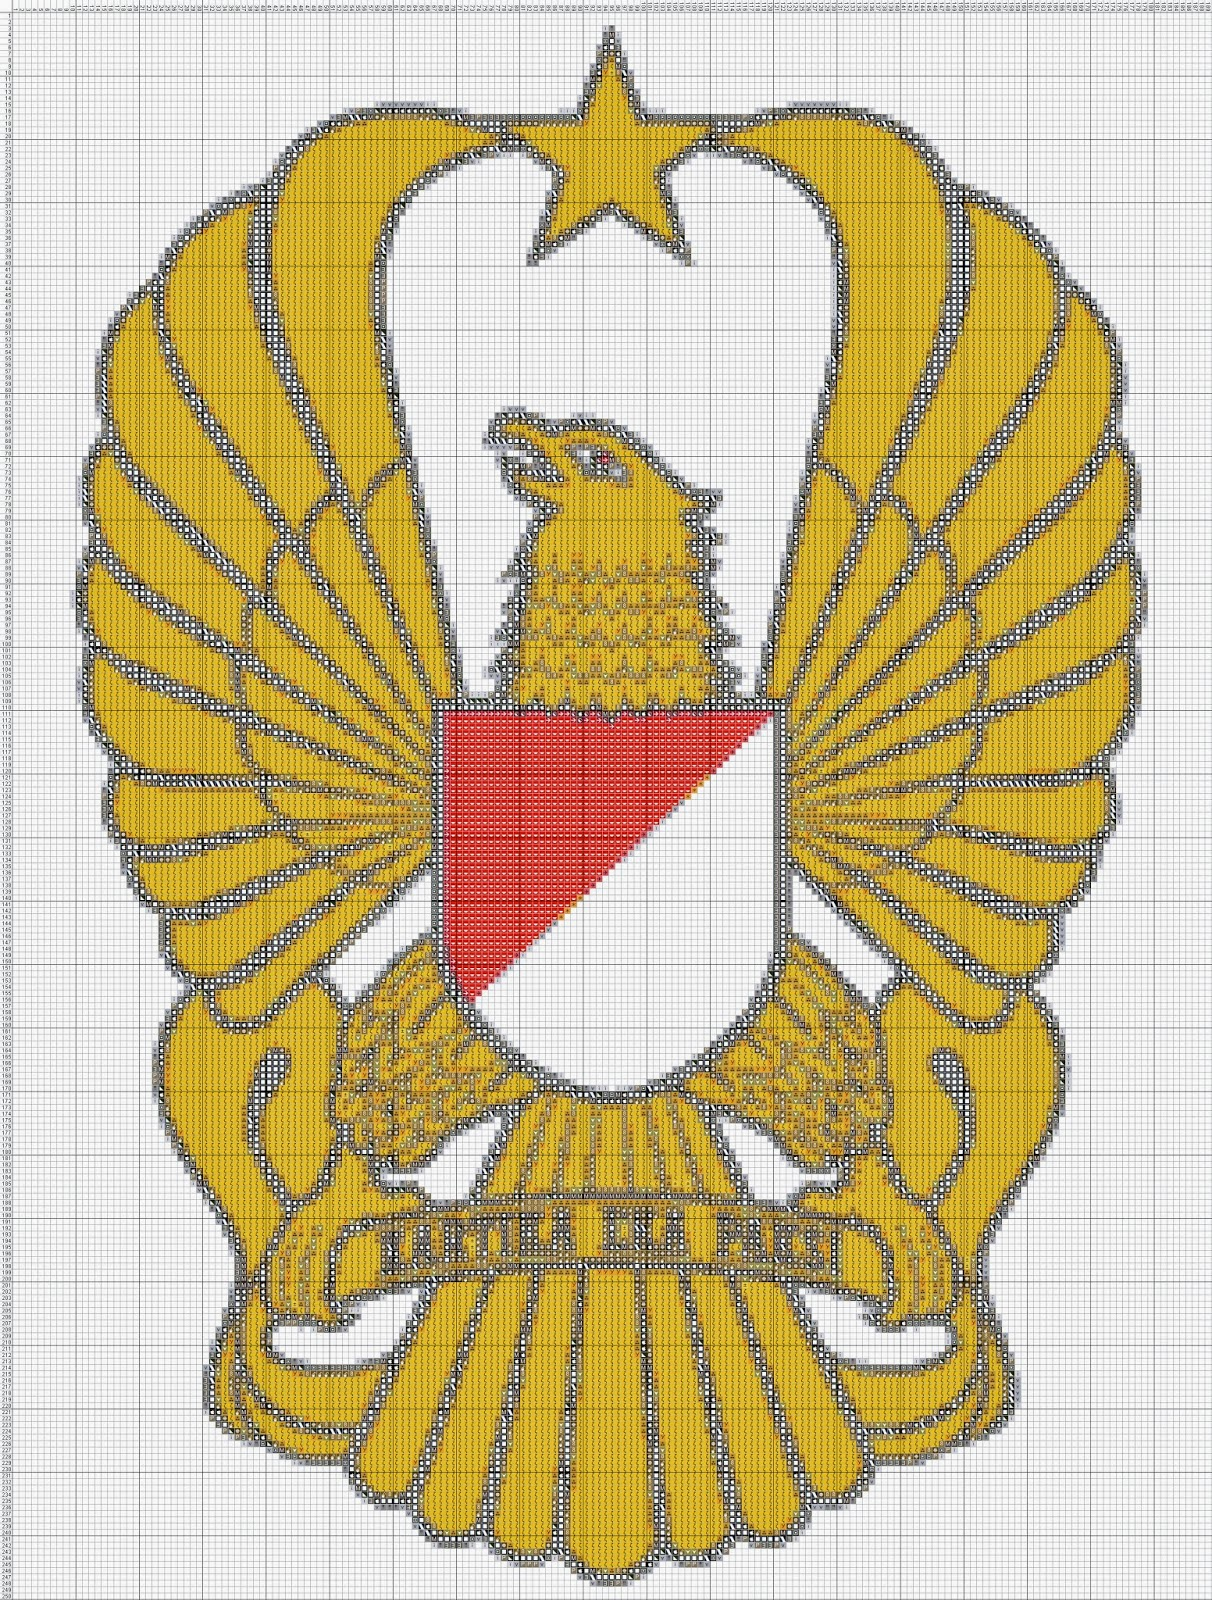 Gambar Pola Kristik Lambang TNI-AD